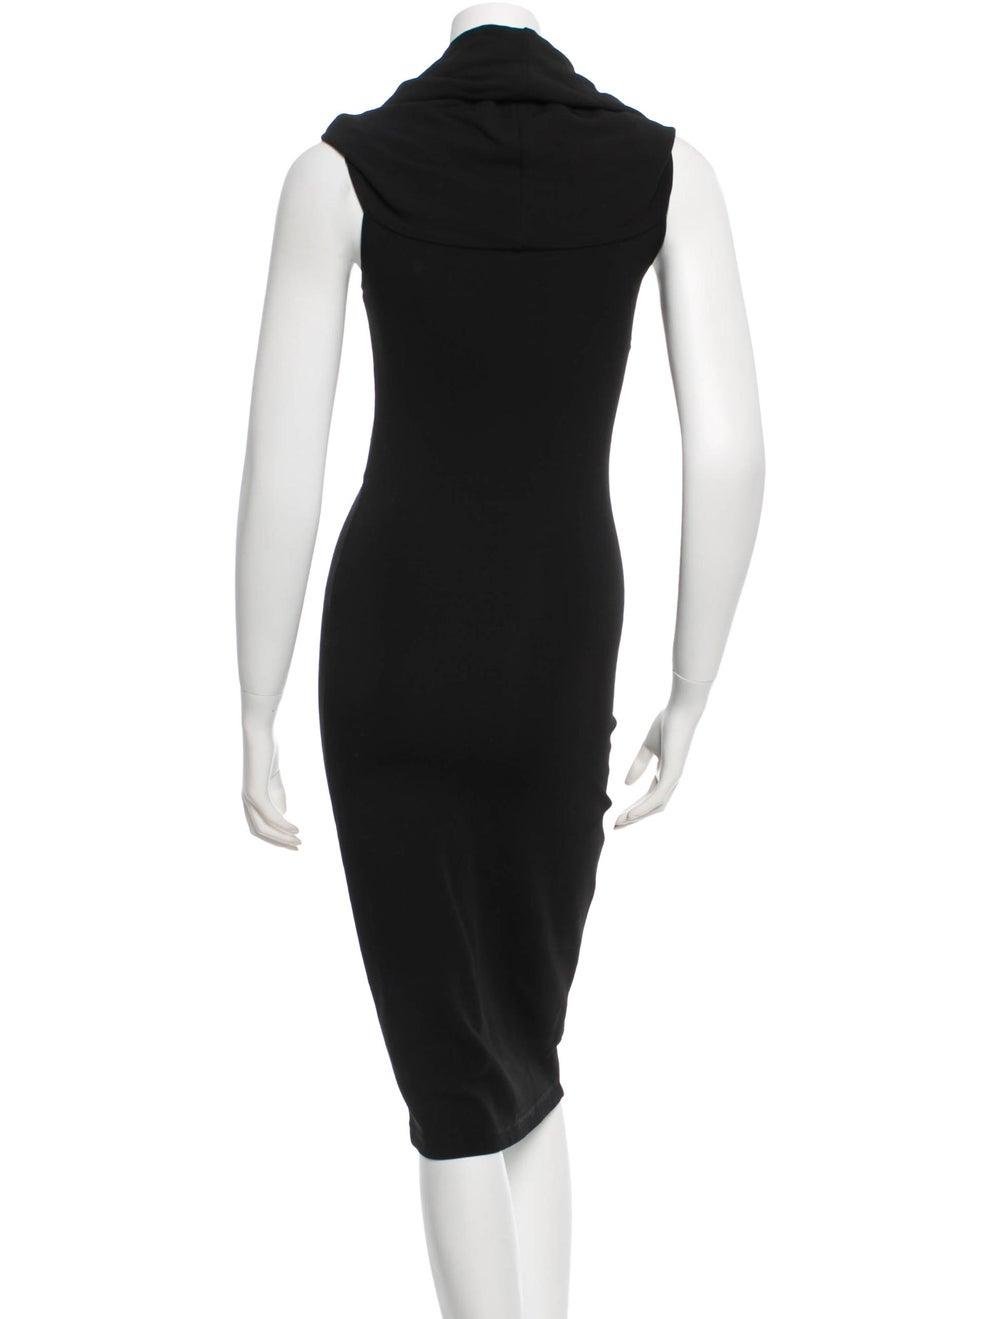 Plein Sud Cowl Neck Midi Dress Black - image 3